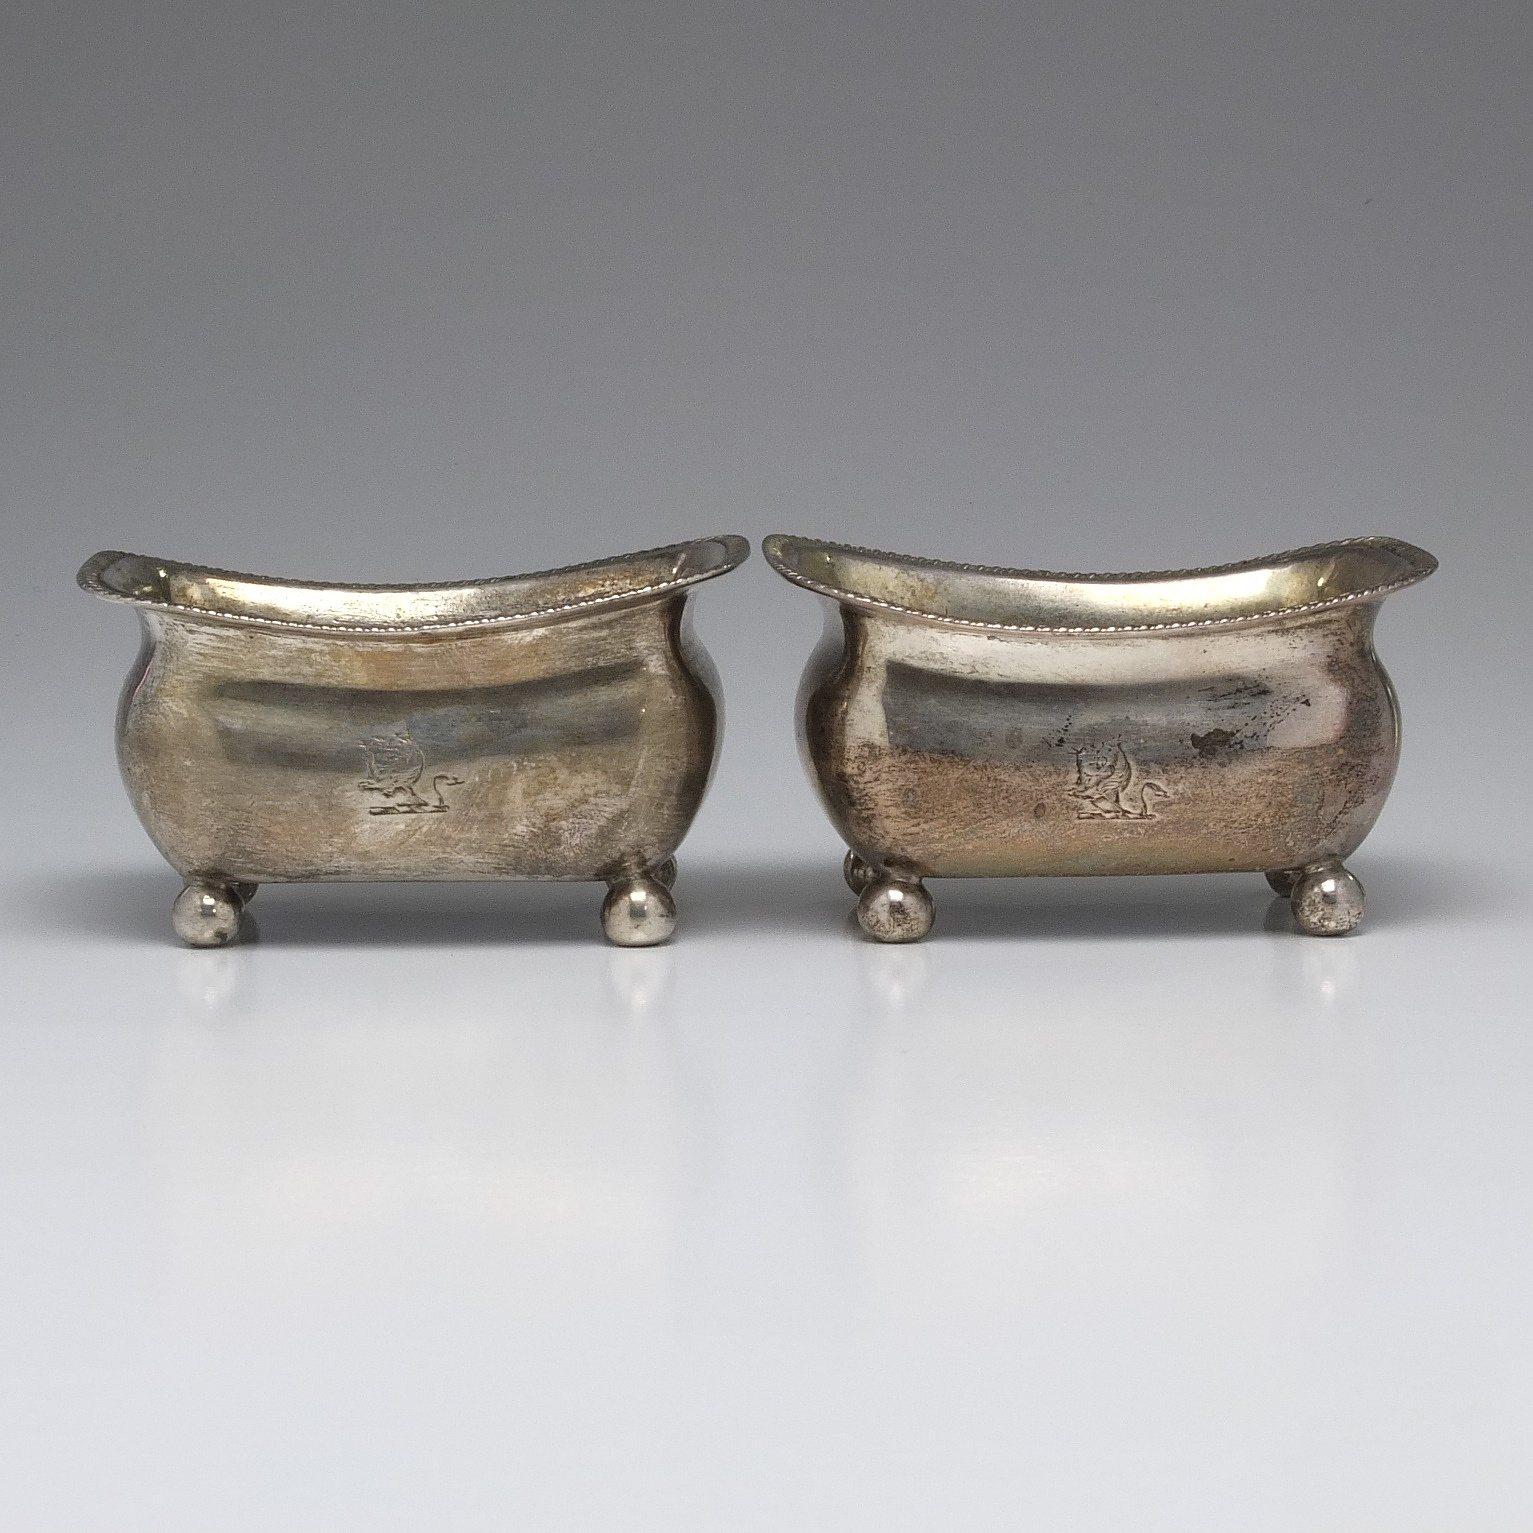 'Pair George III Crested Sterling Silver Open Salts Alice & George Burrows II London 1806'